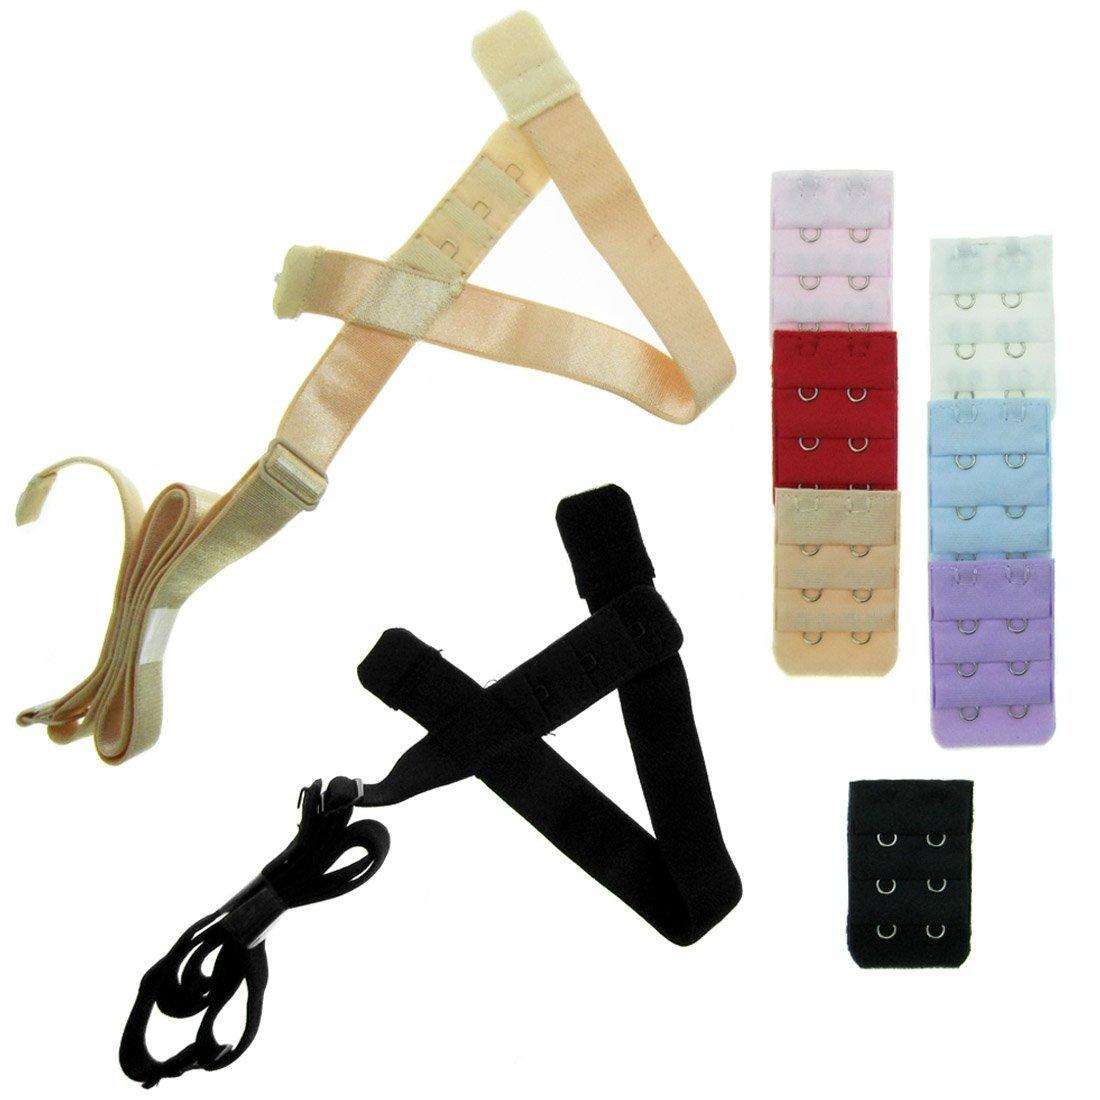 kilofly Low Back Bra Strap Converter Value Pack [Set of 2, Black & Beige + 7 Bra Back Extender, 3 Rows x 2 Hooks] UNW401set9A